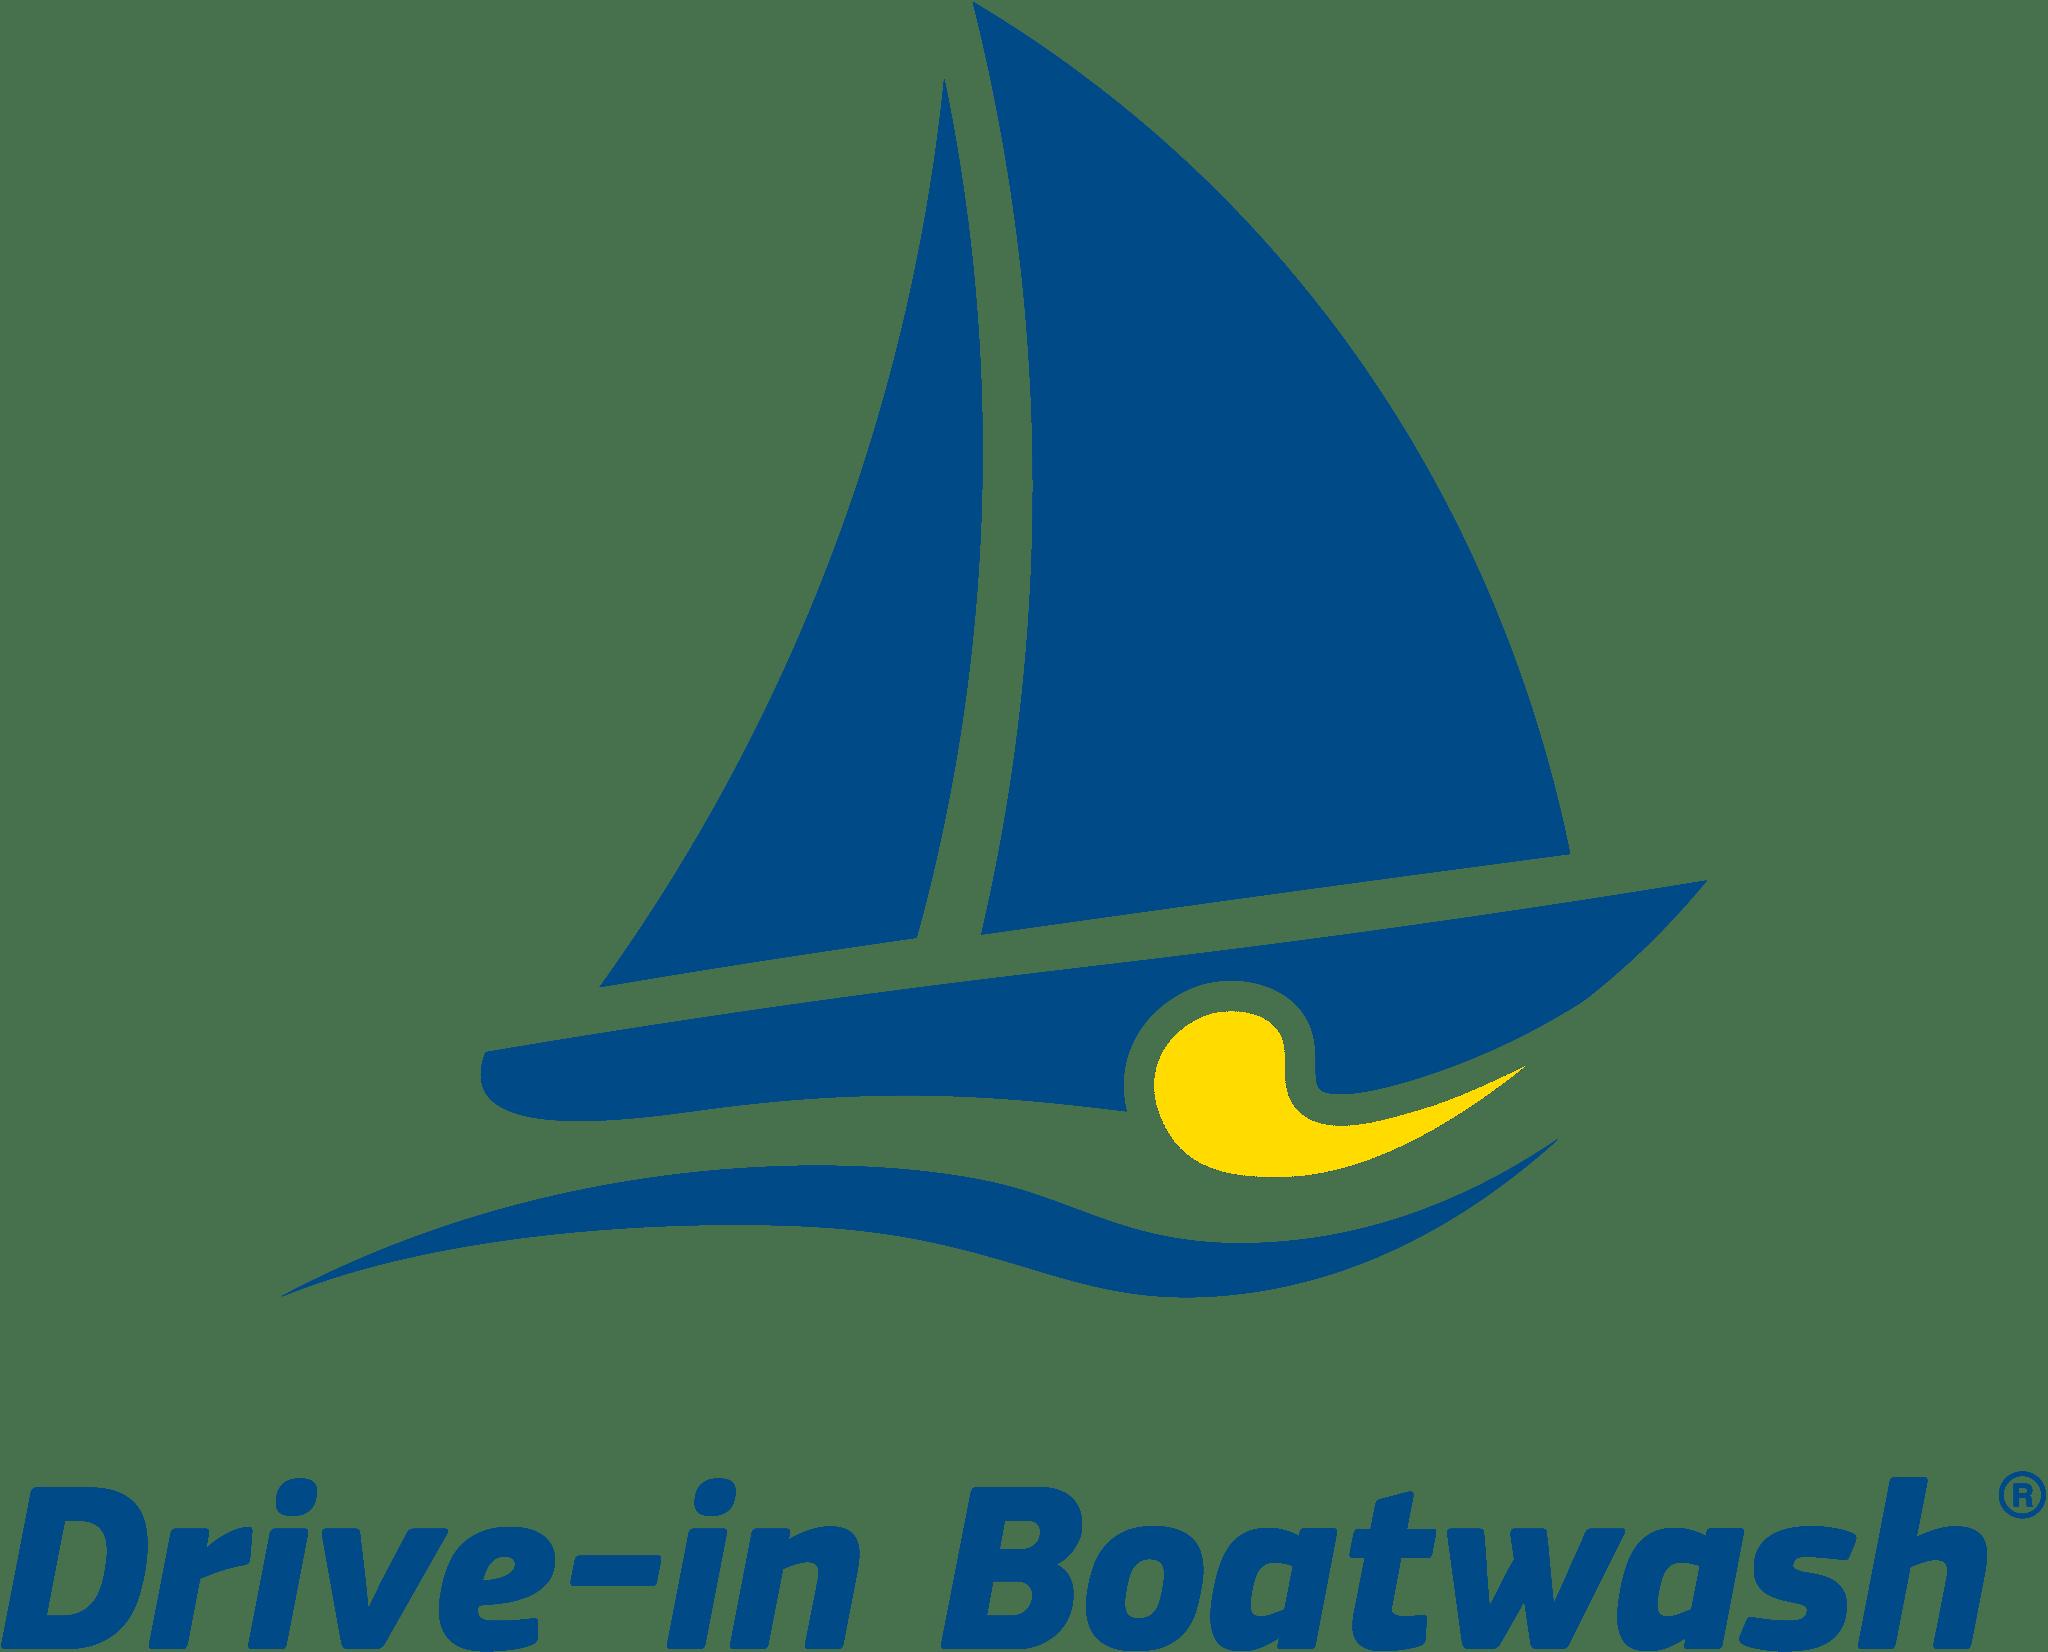 Drive-In Boatwash Logo